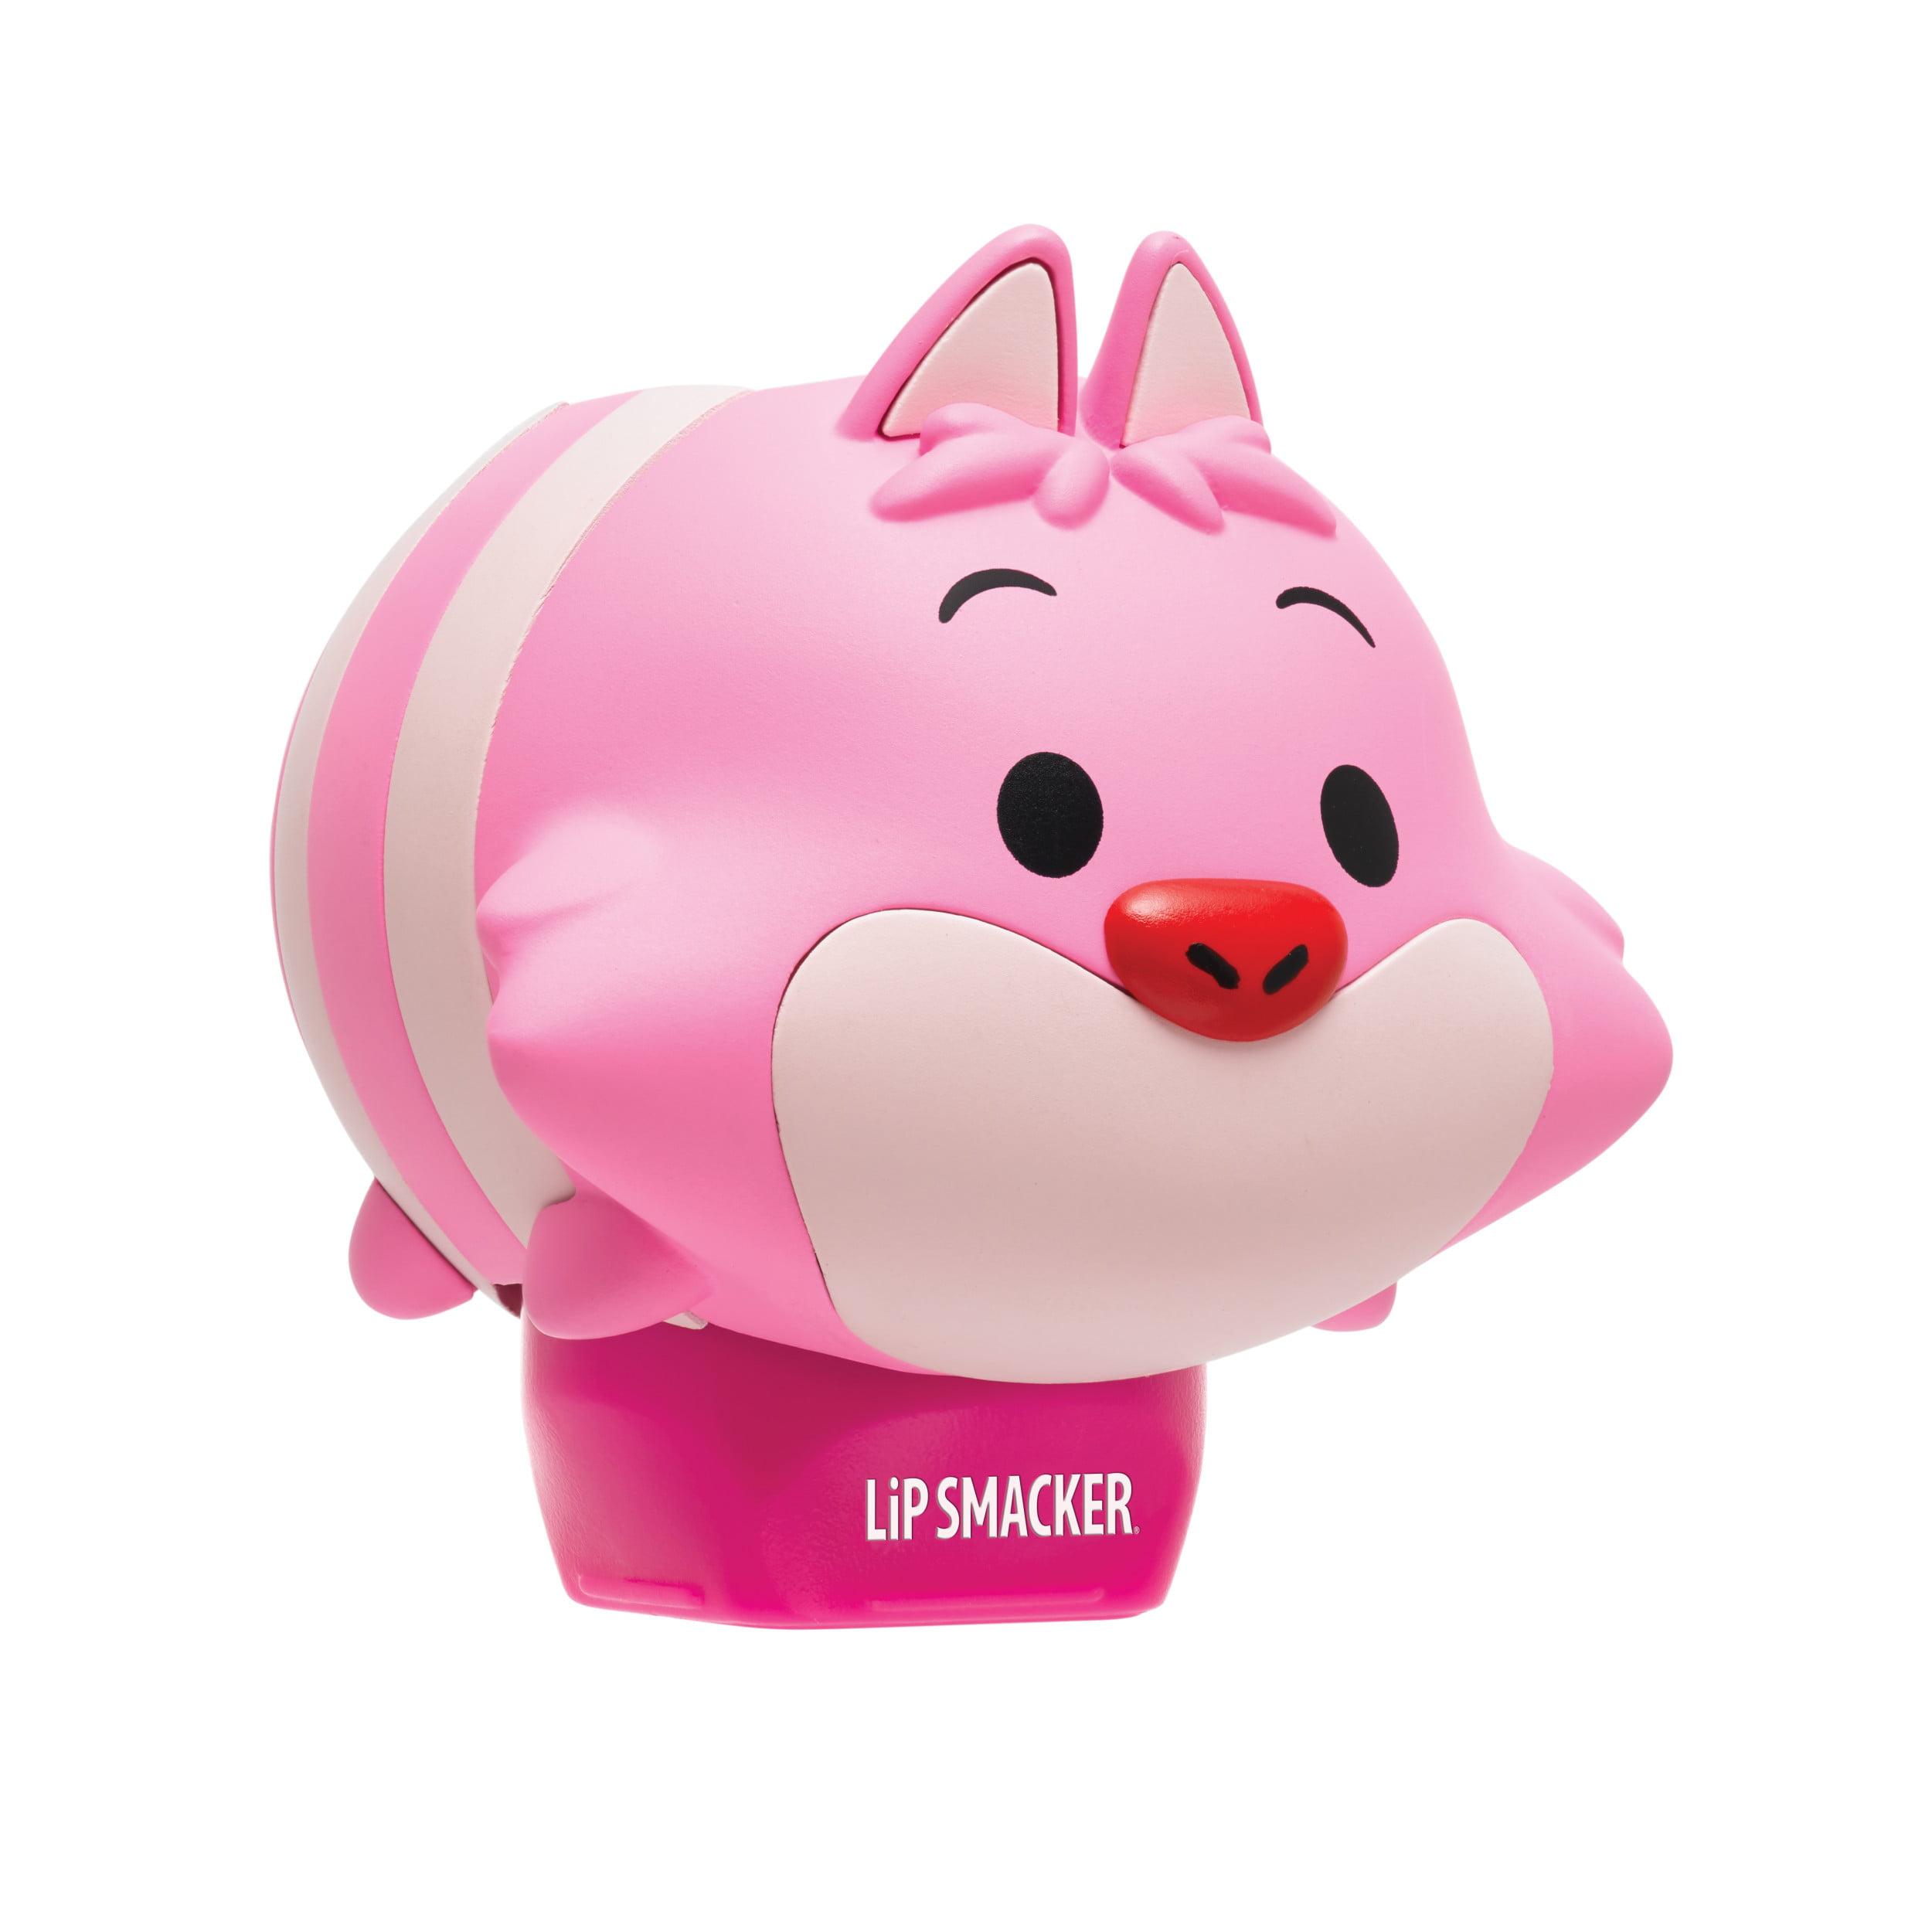 Lip Smacker Disney Tsum Tsum Lip Balm, Minnie Strawberry Lollipop